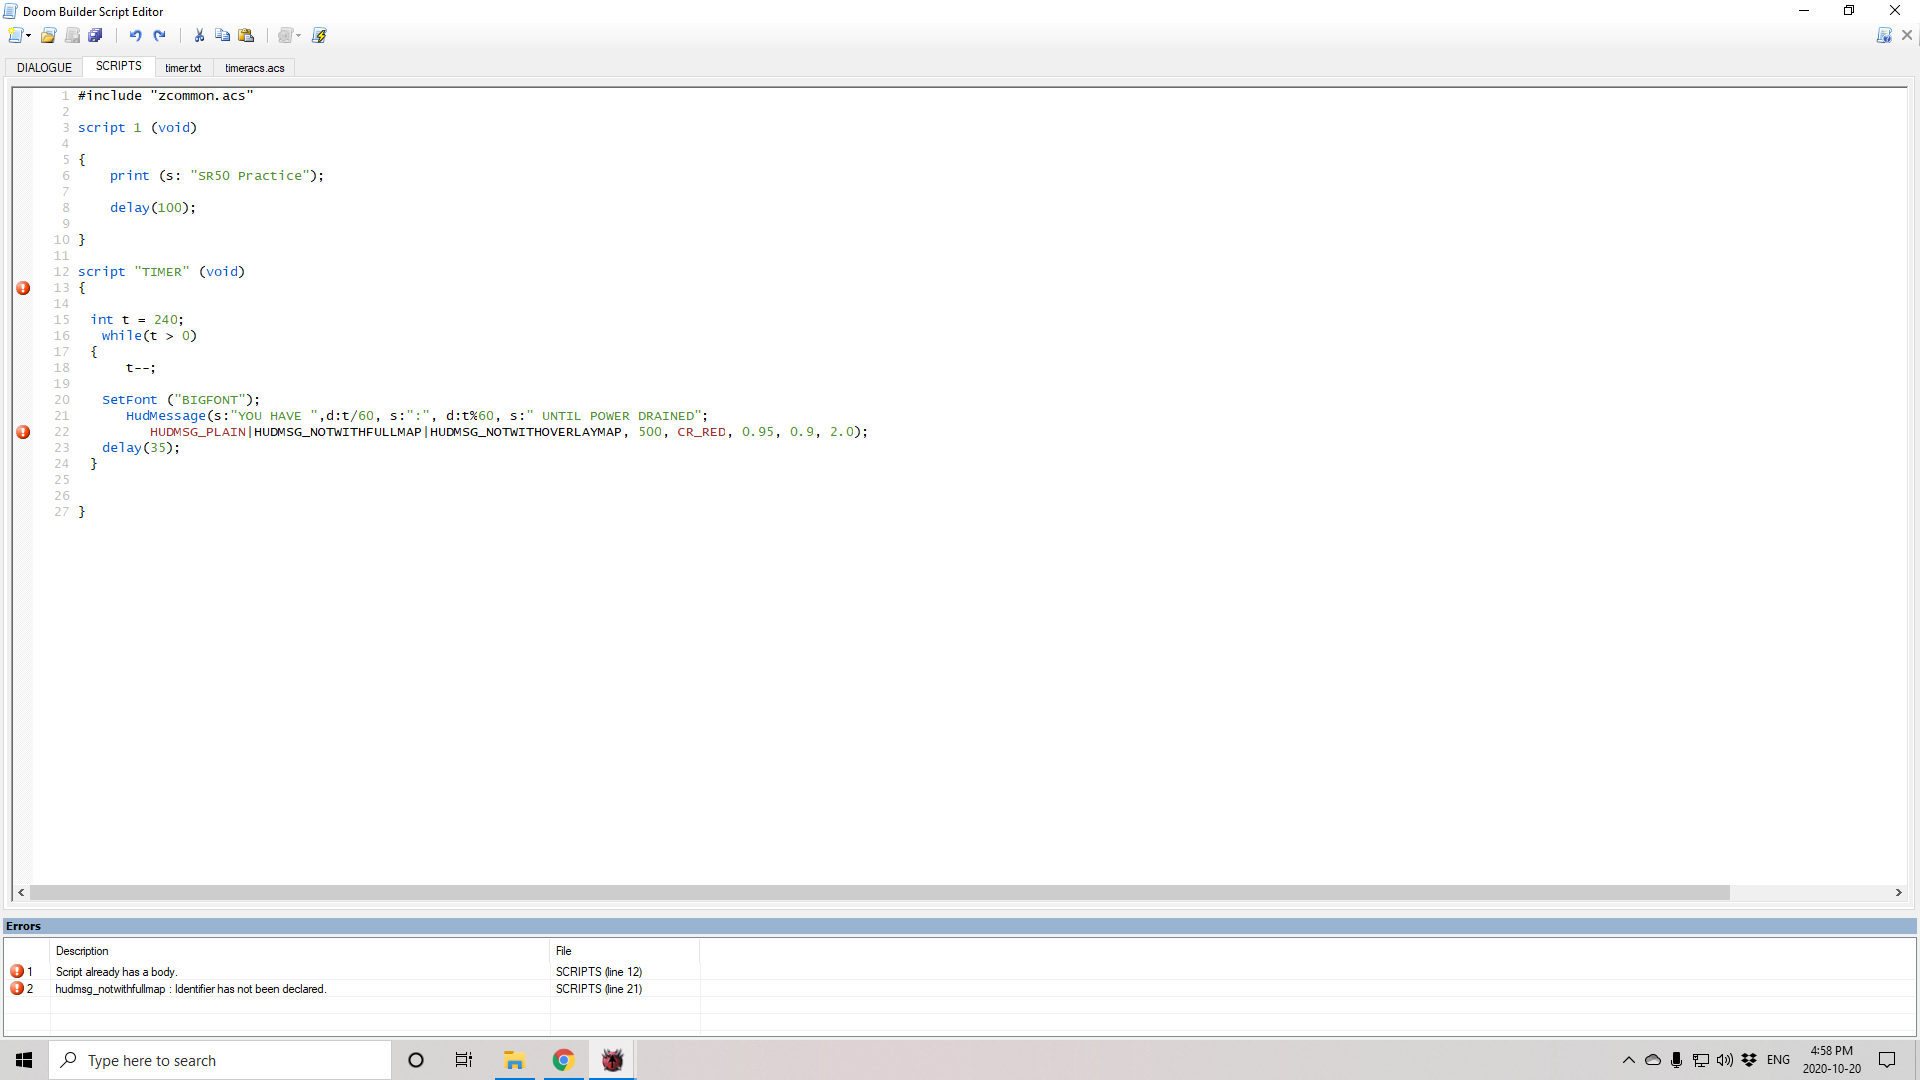 1216297357_Screenshot(10).png.2d95409ad7b78db6527ddc93fd31f4e5.png